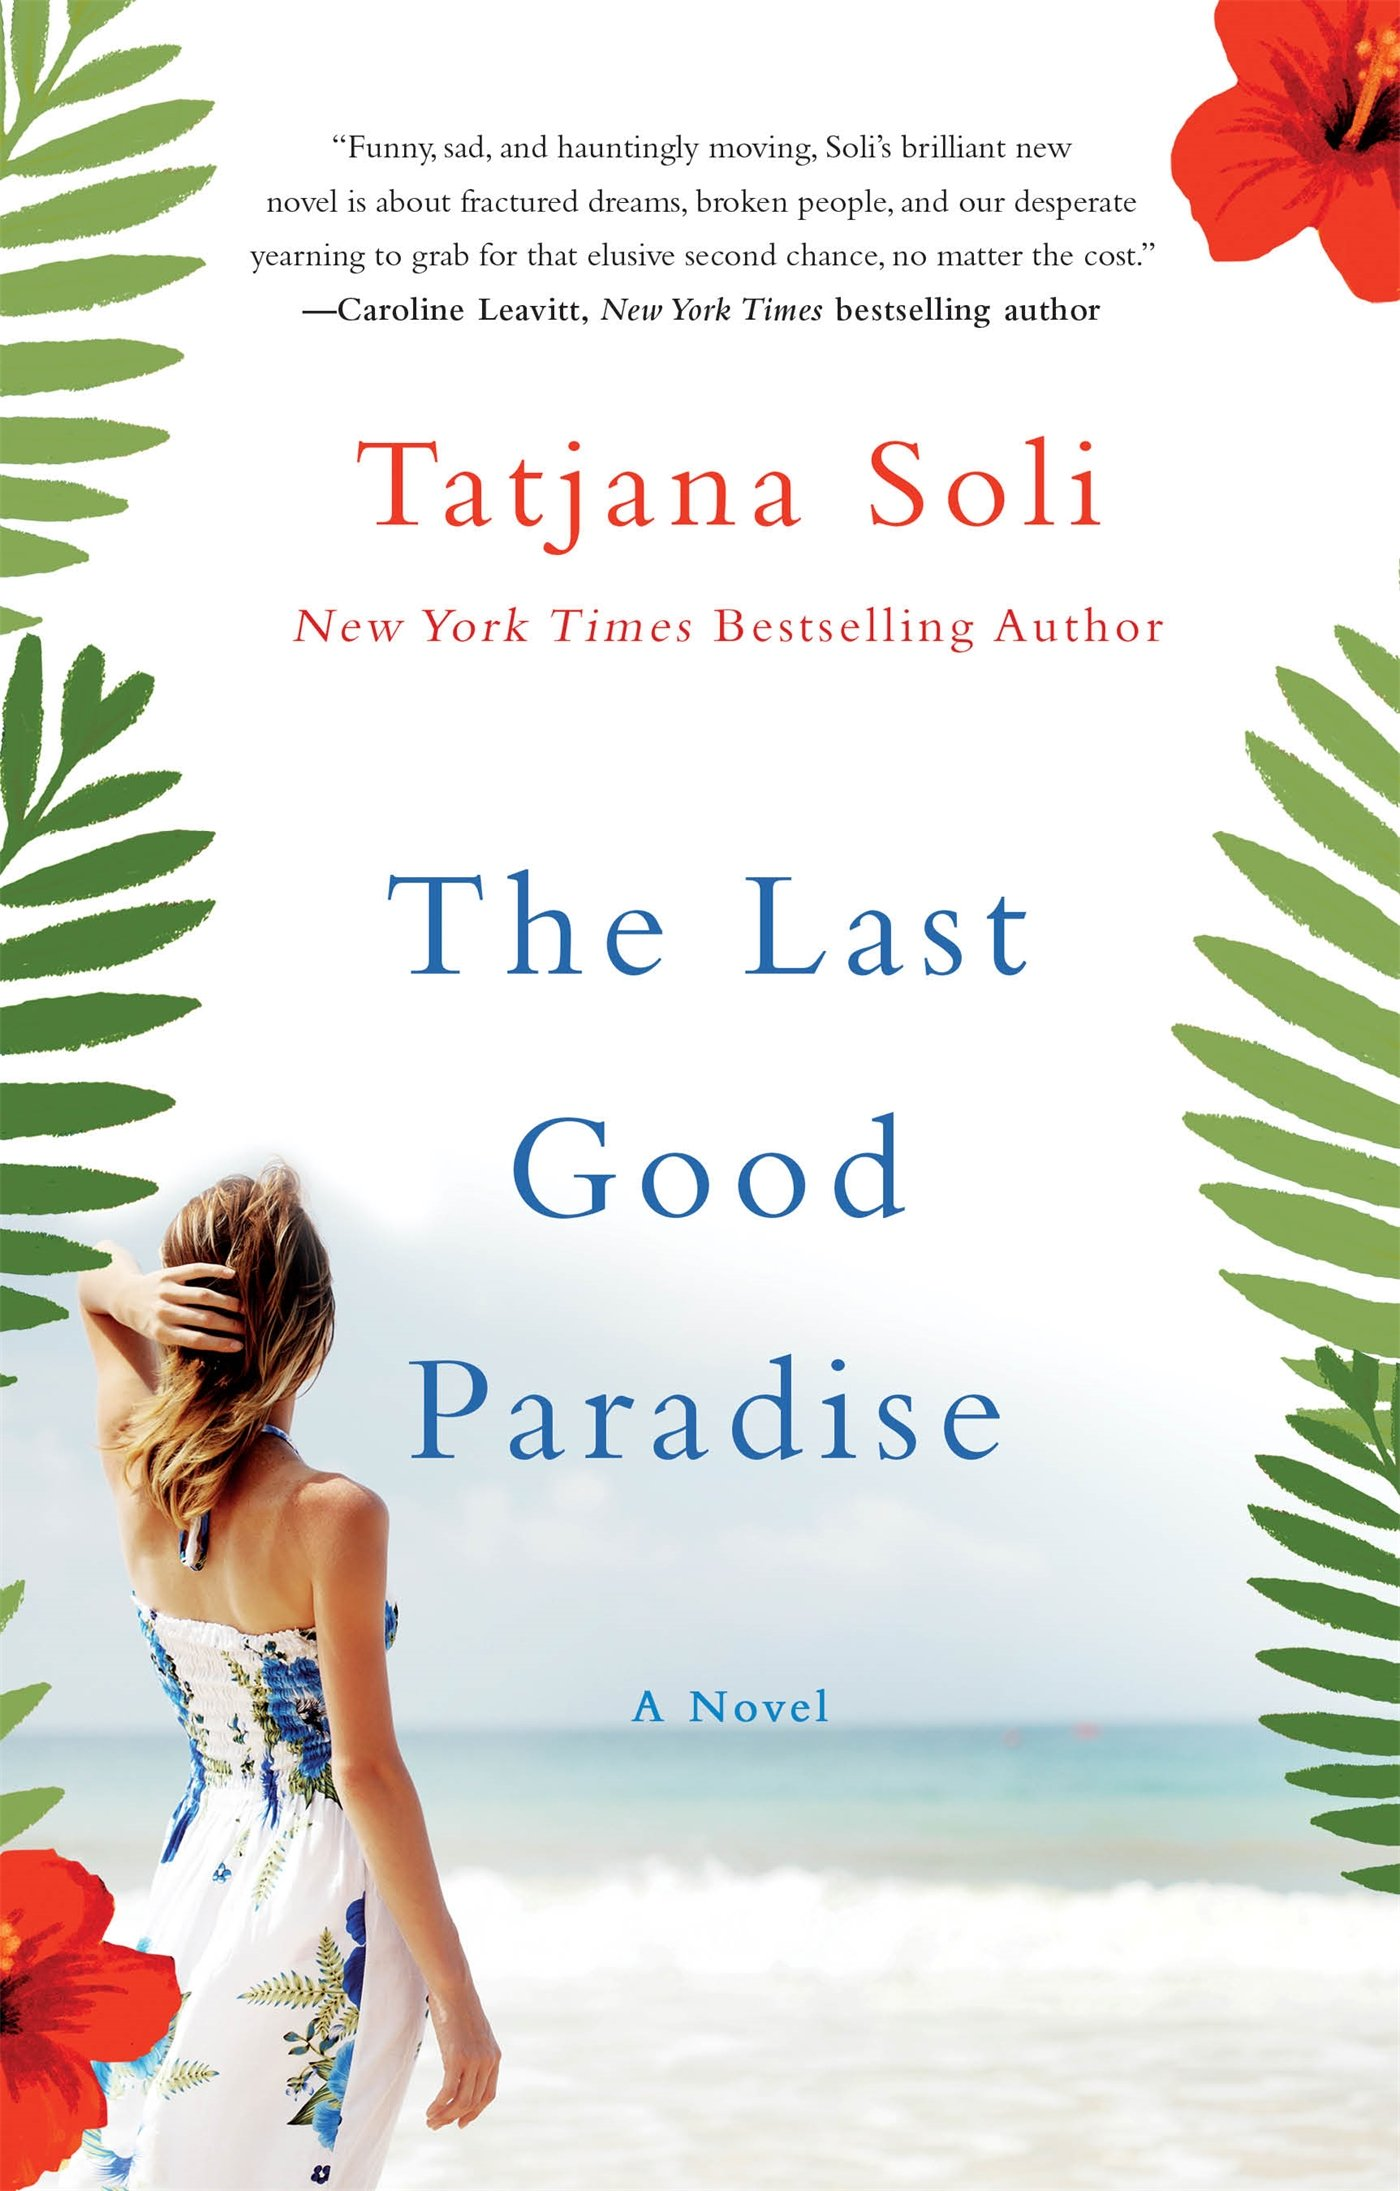 Read The Last Good Paradise By Tatjana Soli